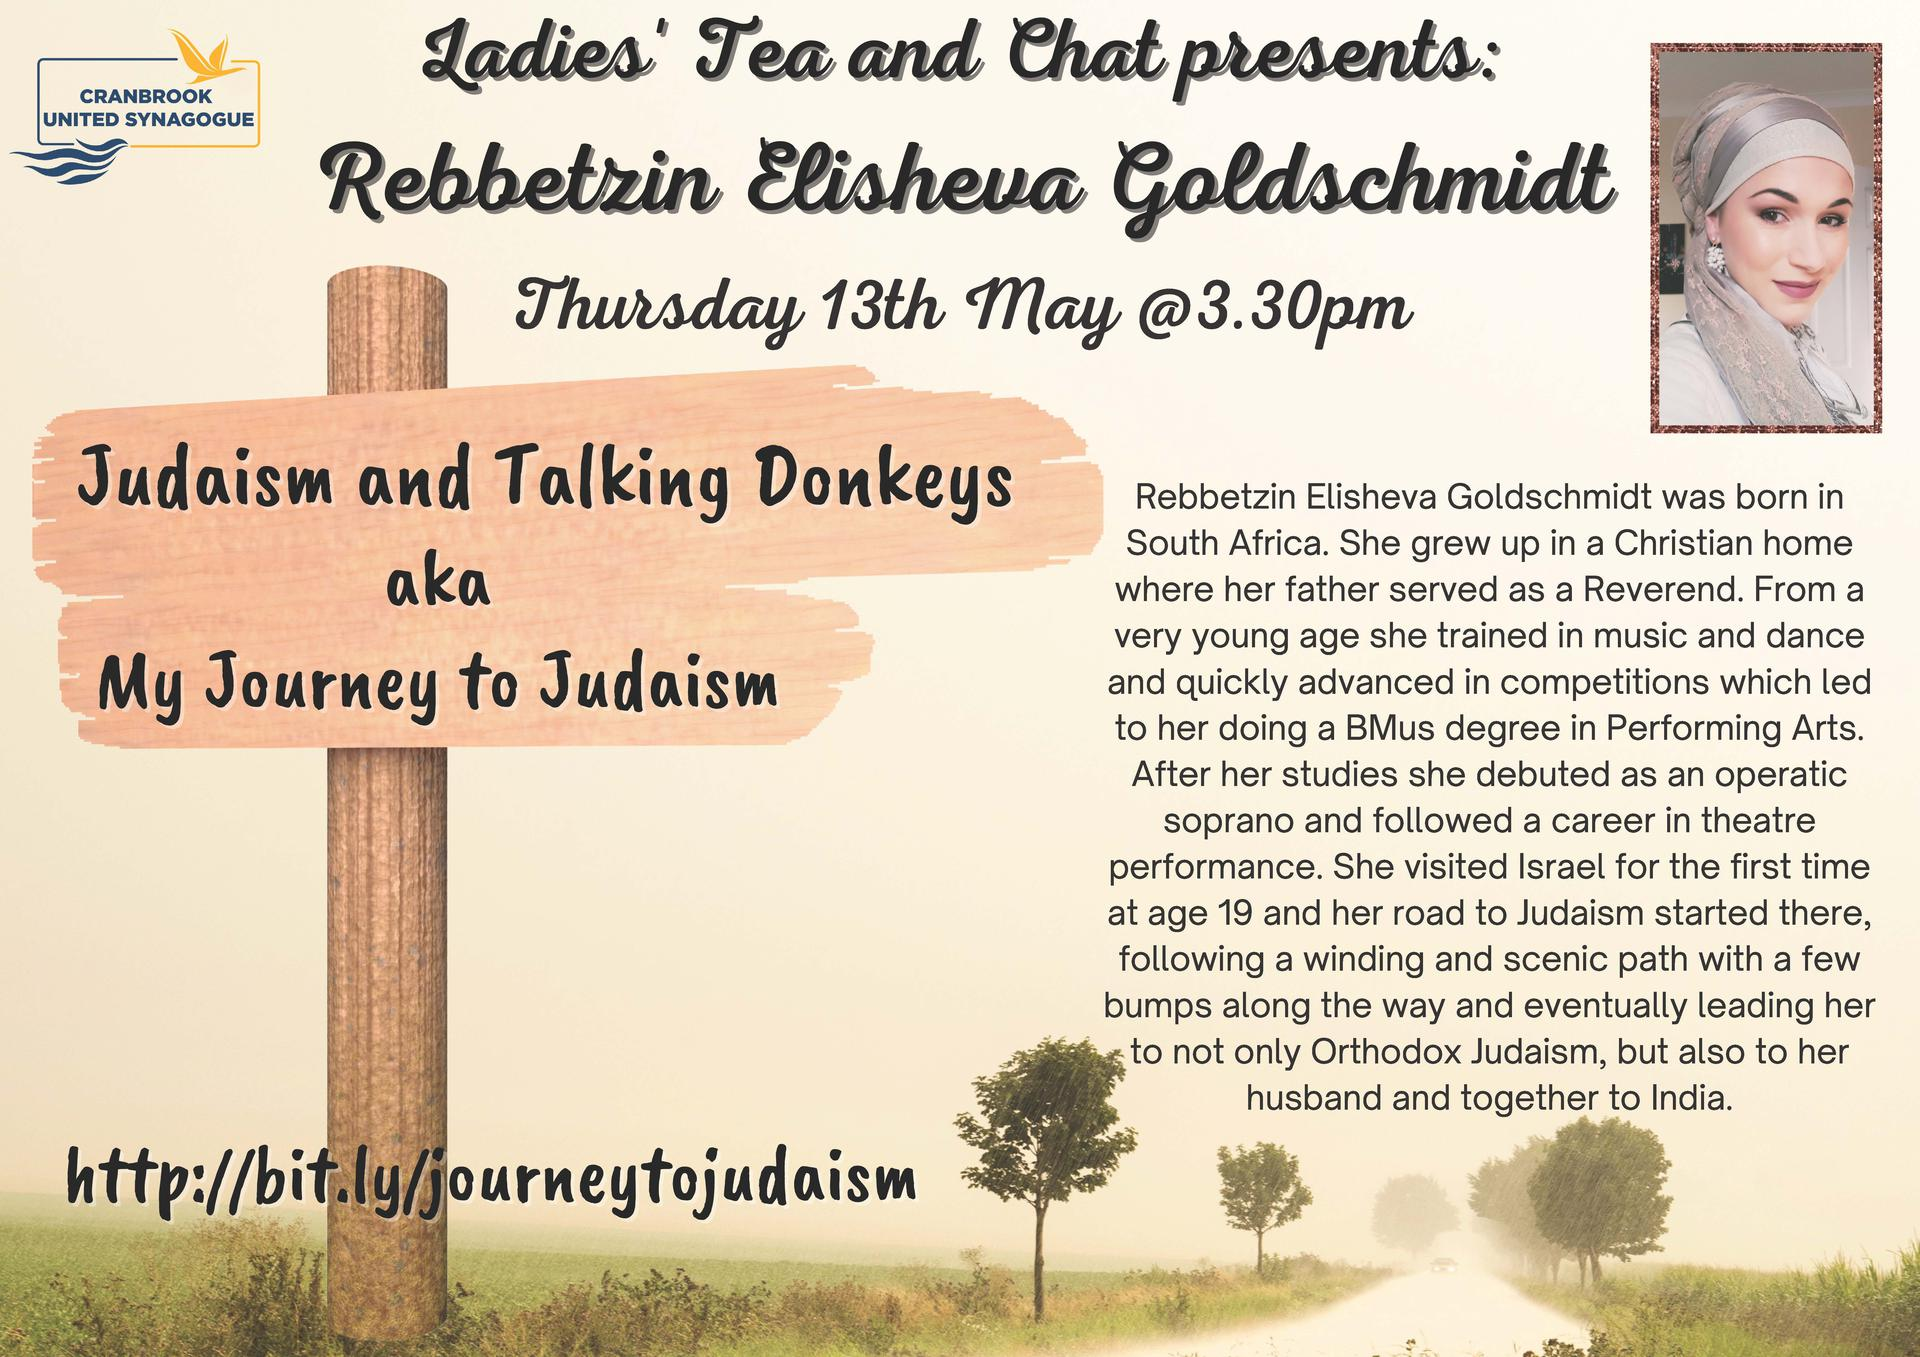 Ladies Tea & Chat